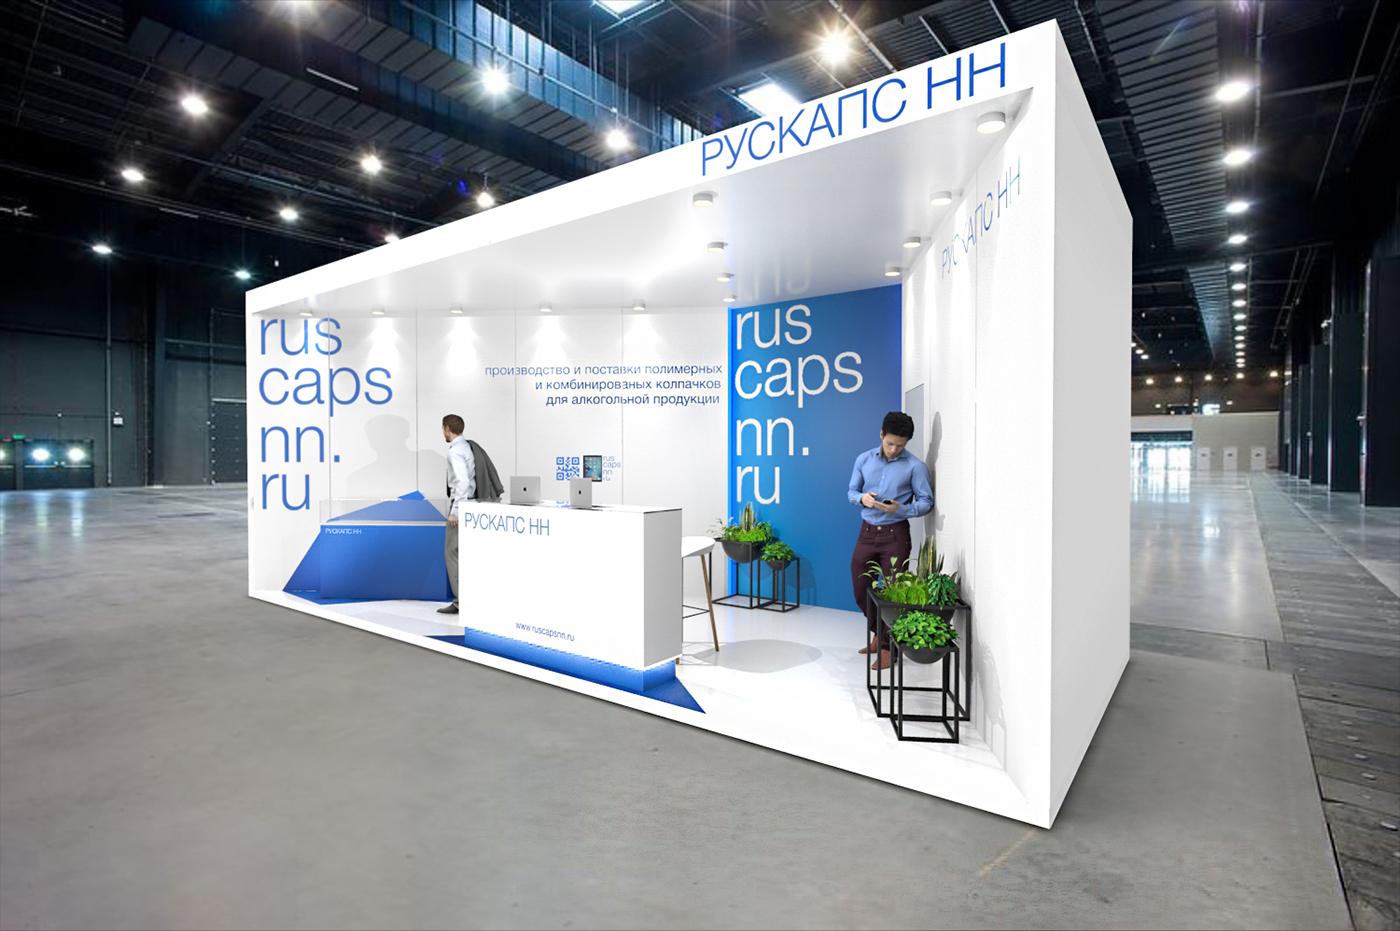 Exhibition Stand Design Jobs London : Exhibition stand design on behance